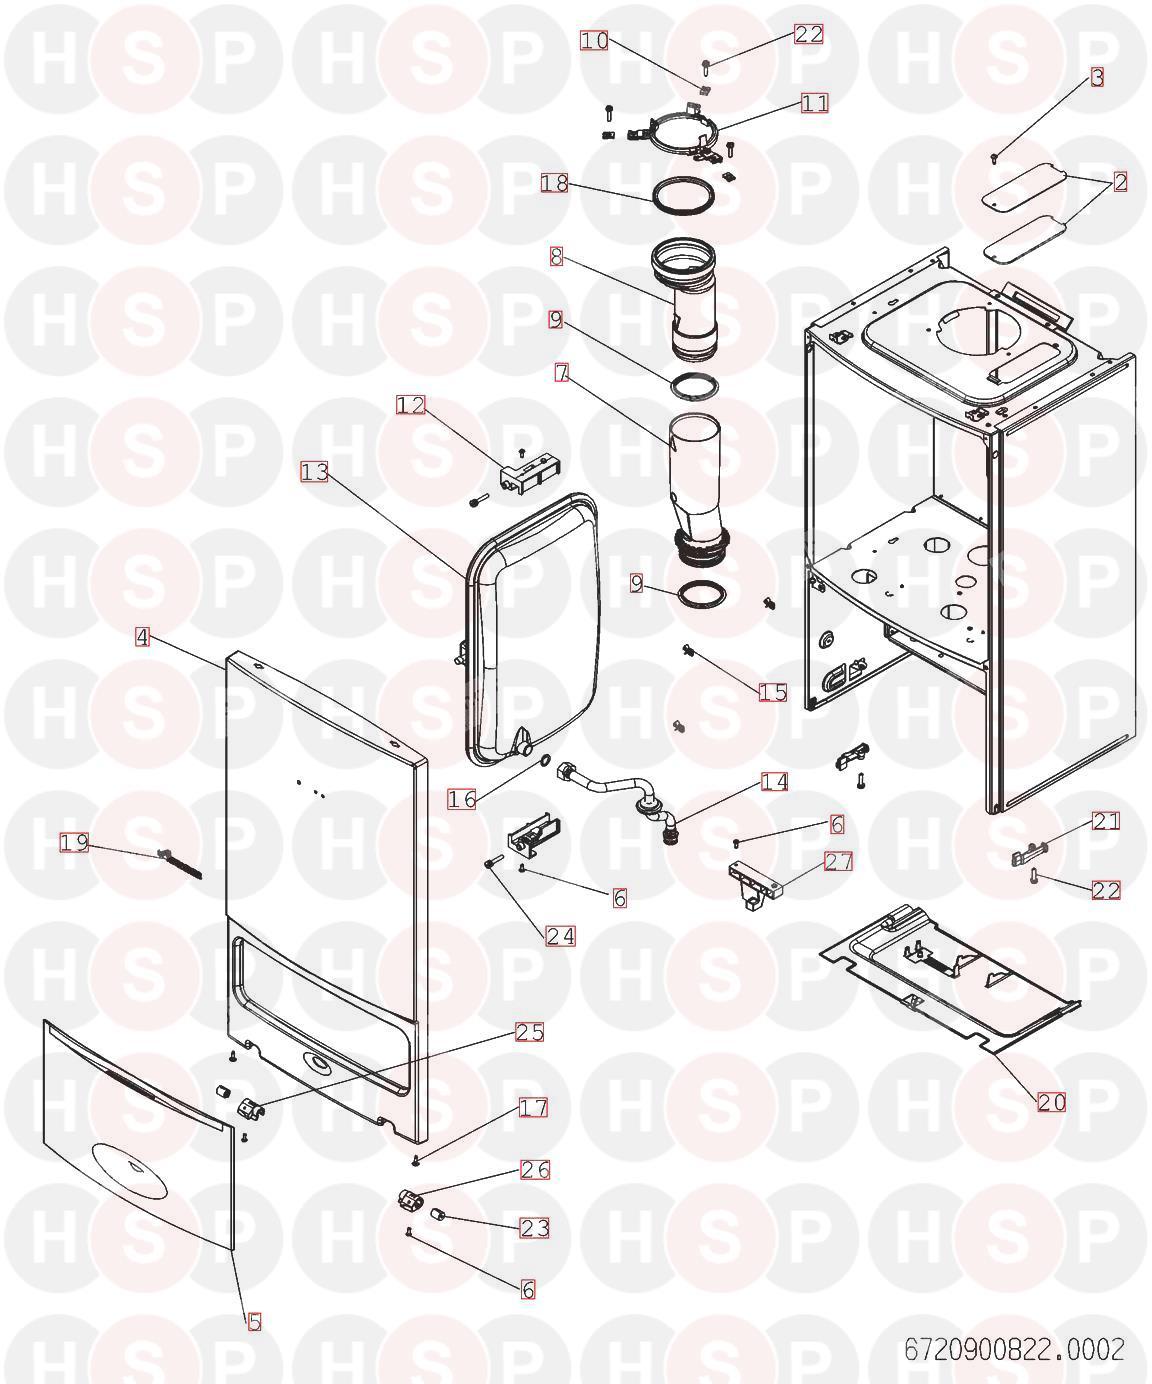 Worcester GREENSTAR 30 i ERP Appliance Diagram (CASING